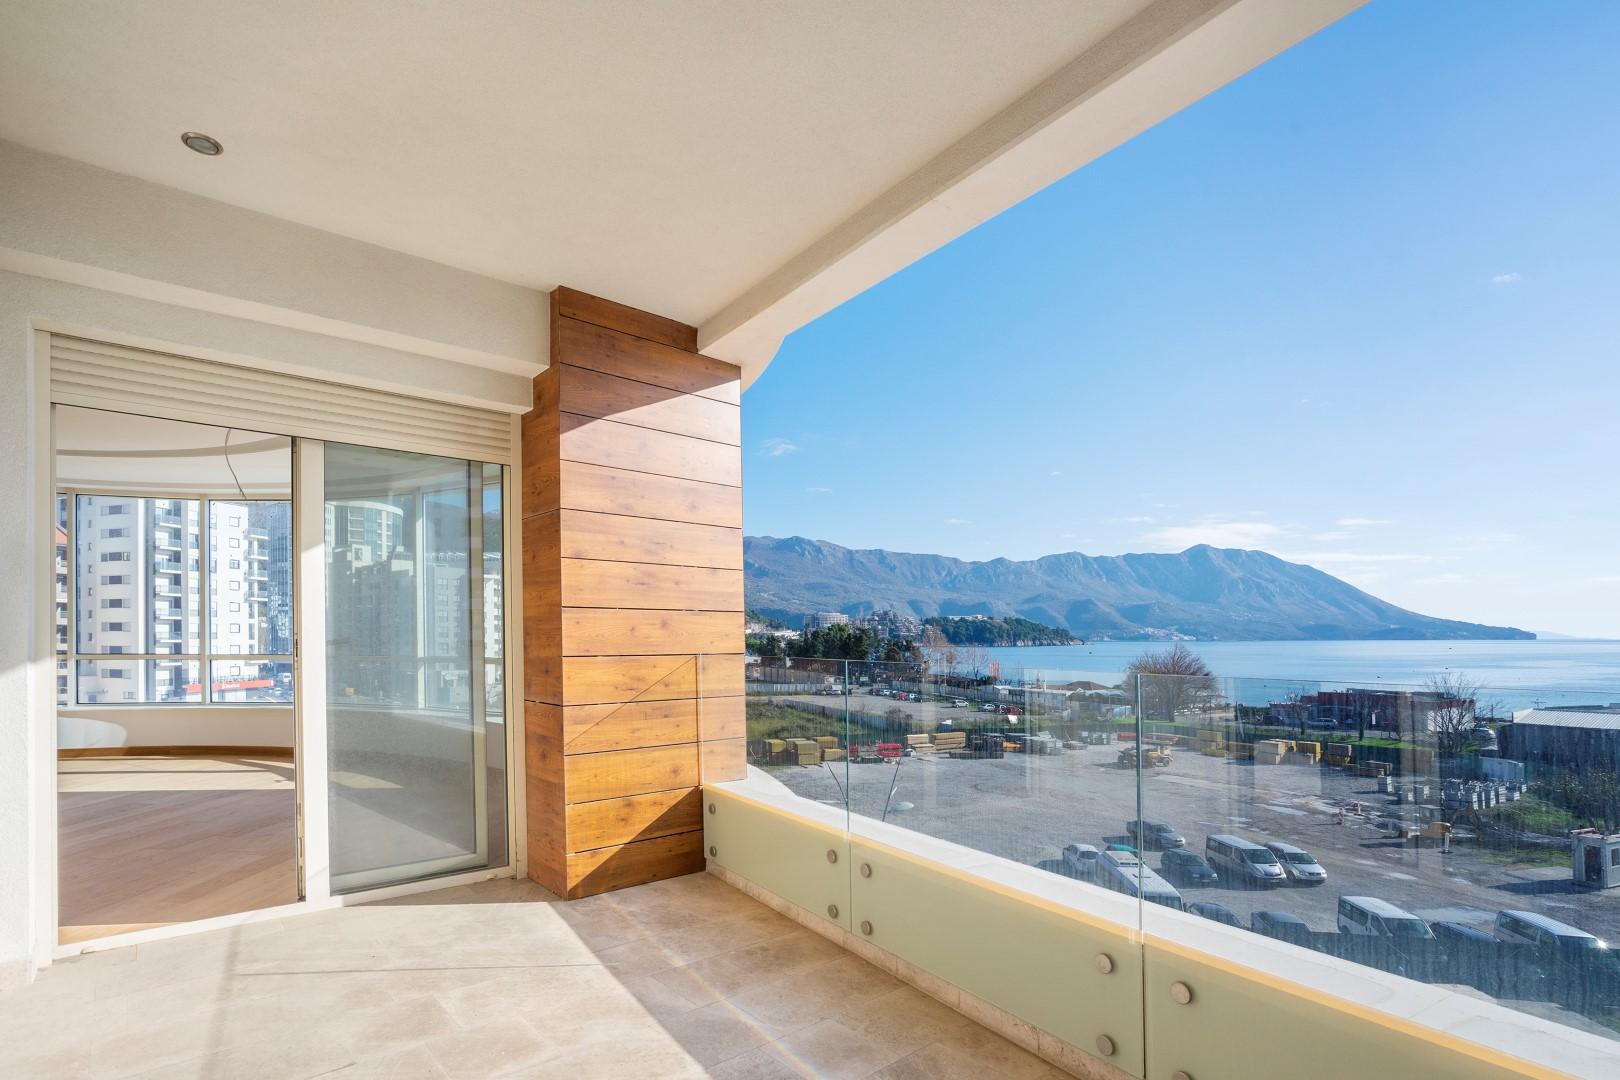 Будва, улица Медитеранская — трехкомнатная квартира с панорамным видом на море